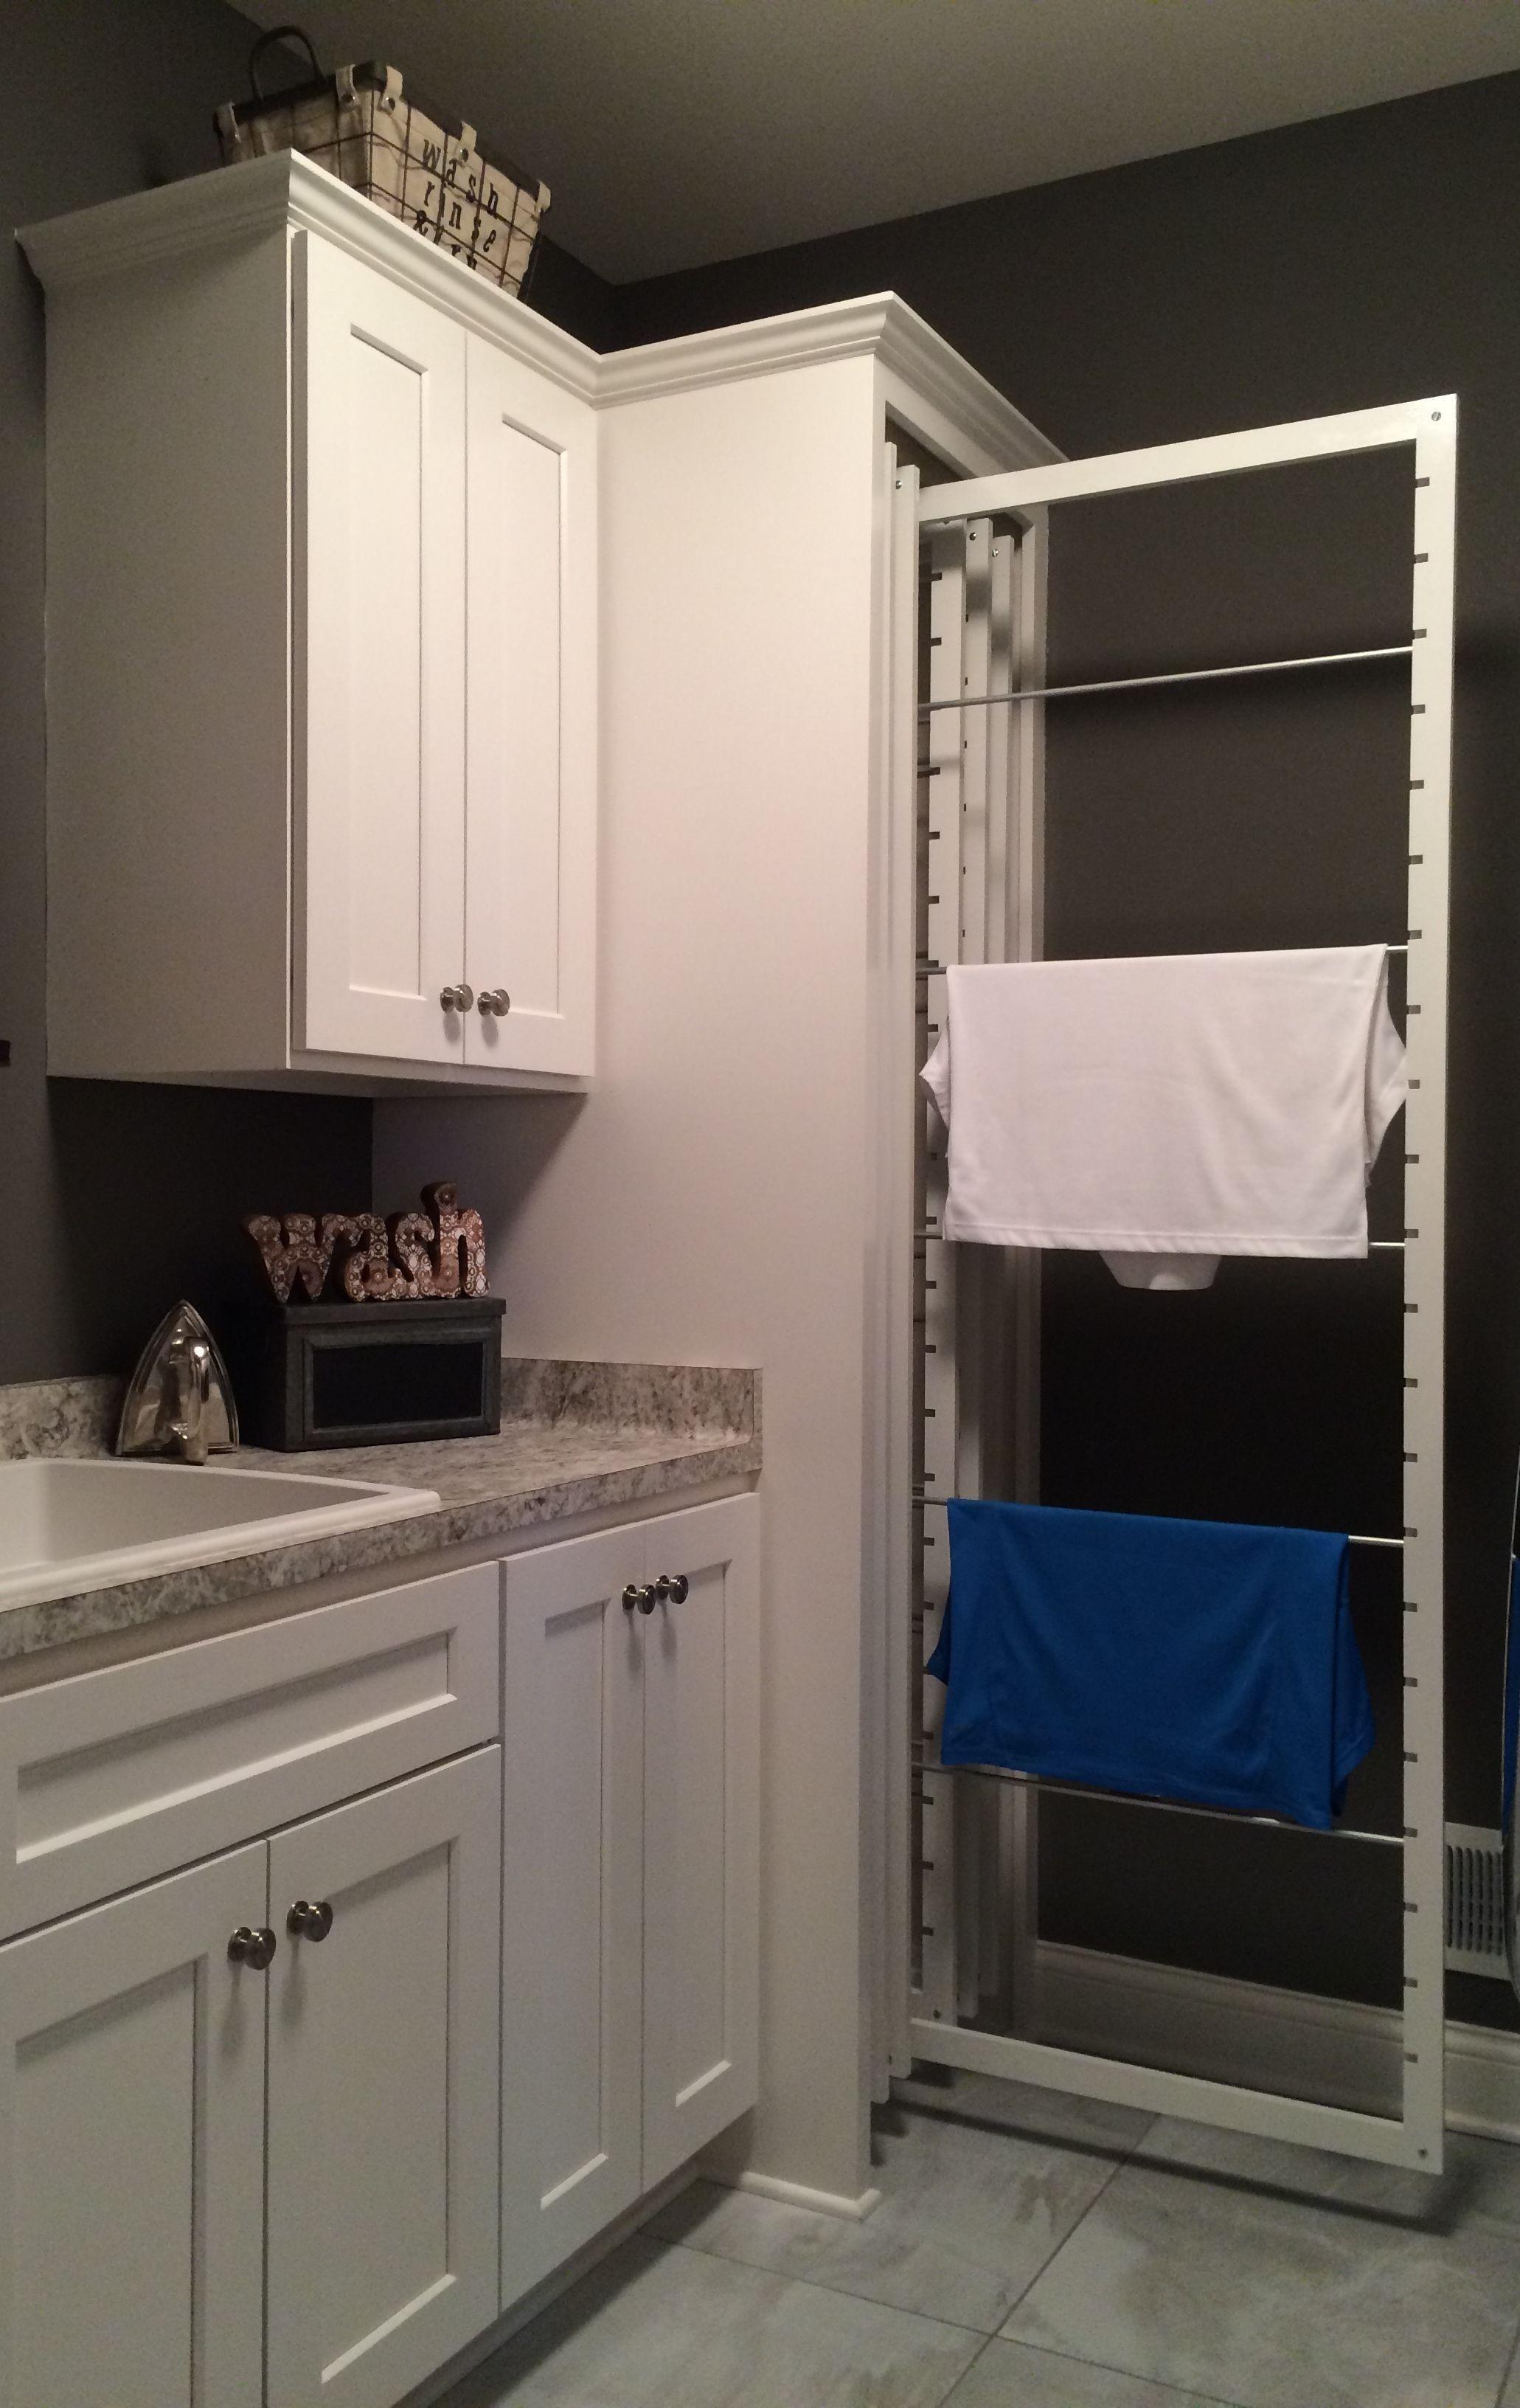 19+ Elegant Laundry Room Design Ideas - GAGOHOME